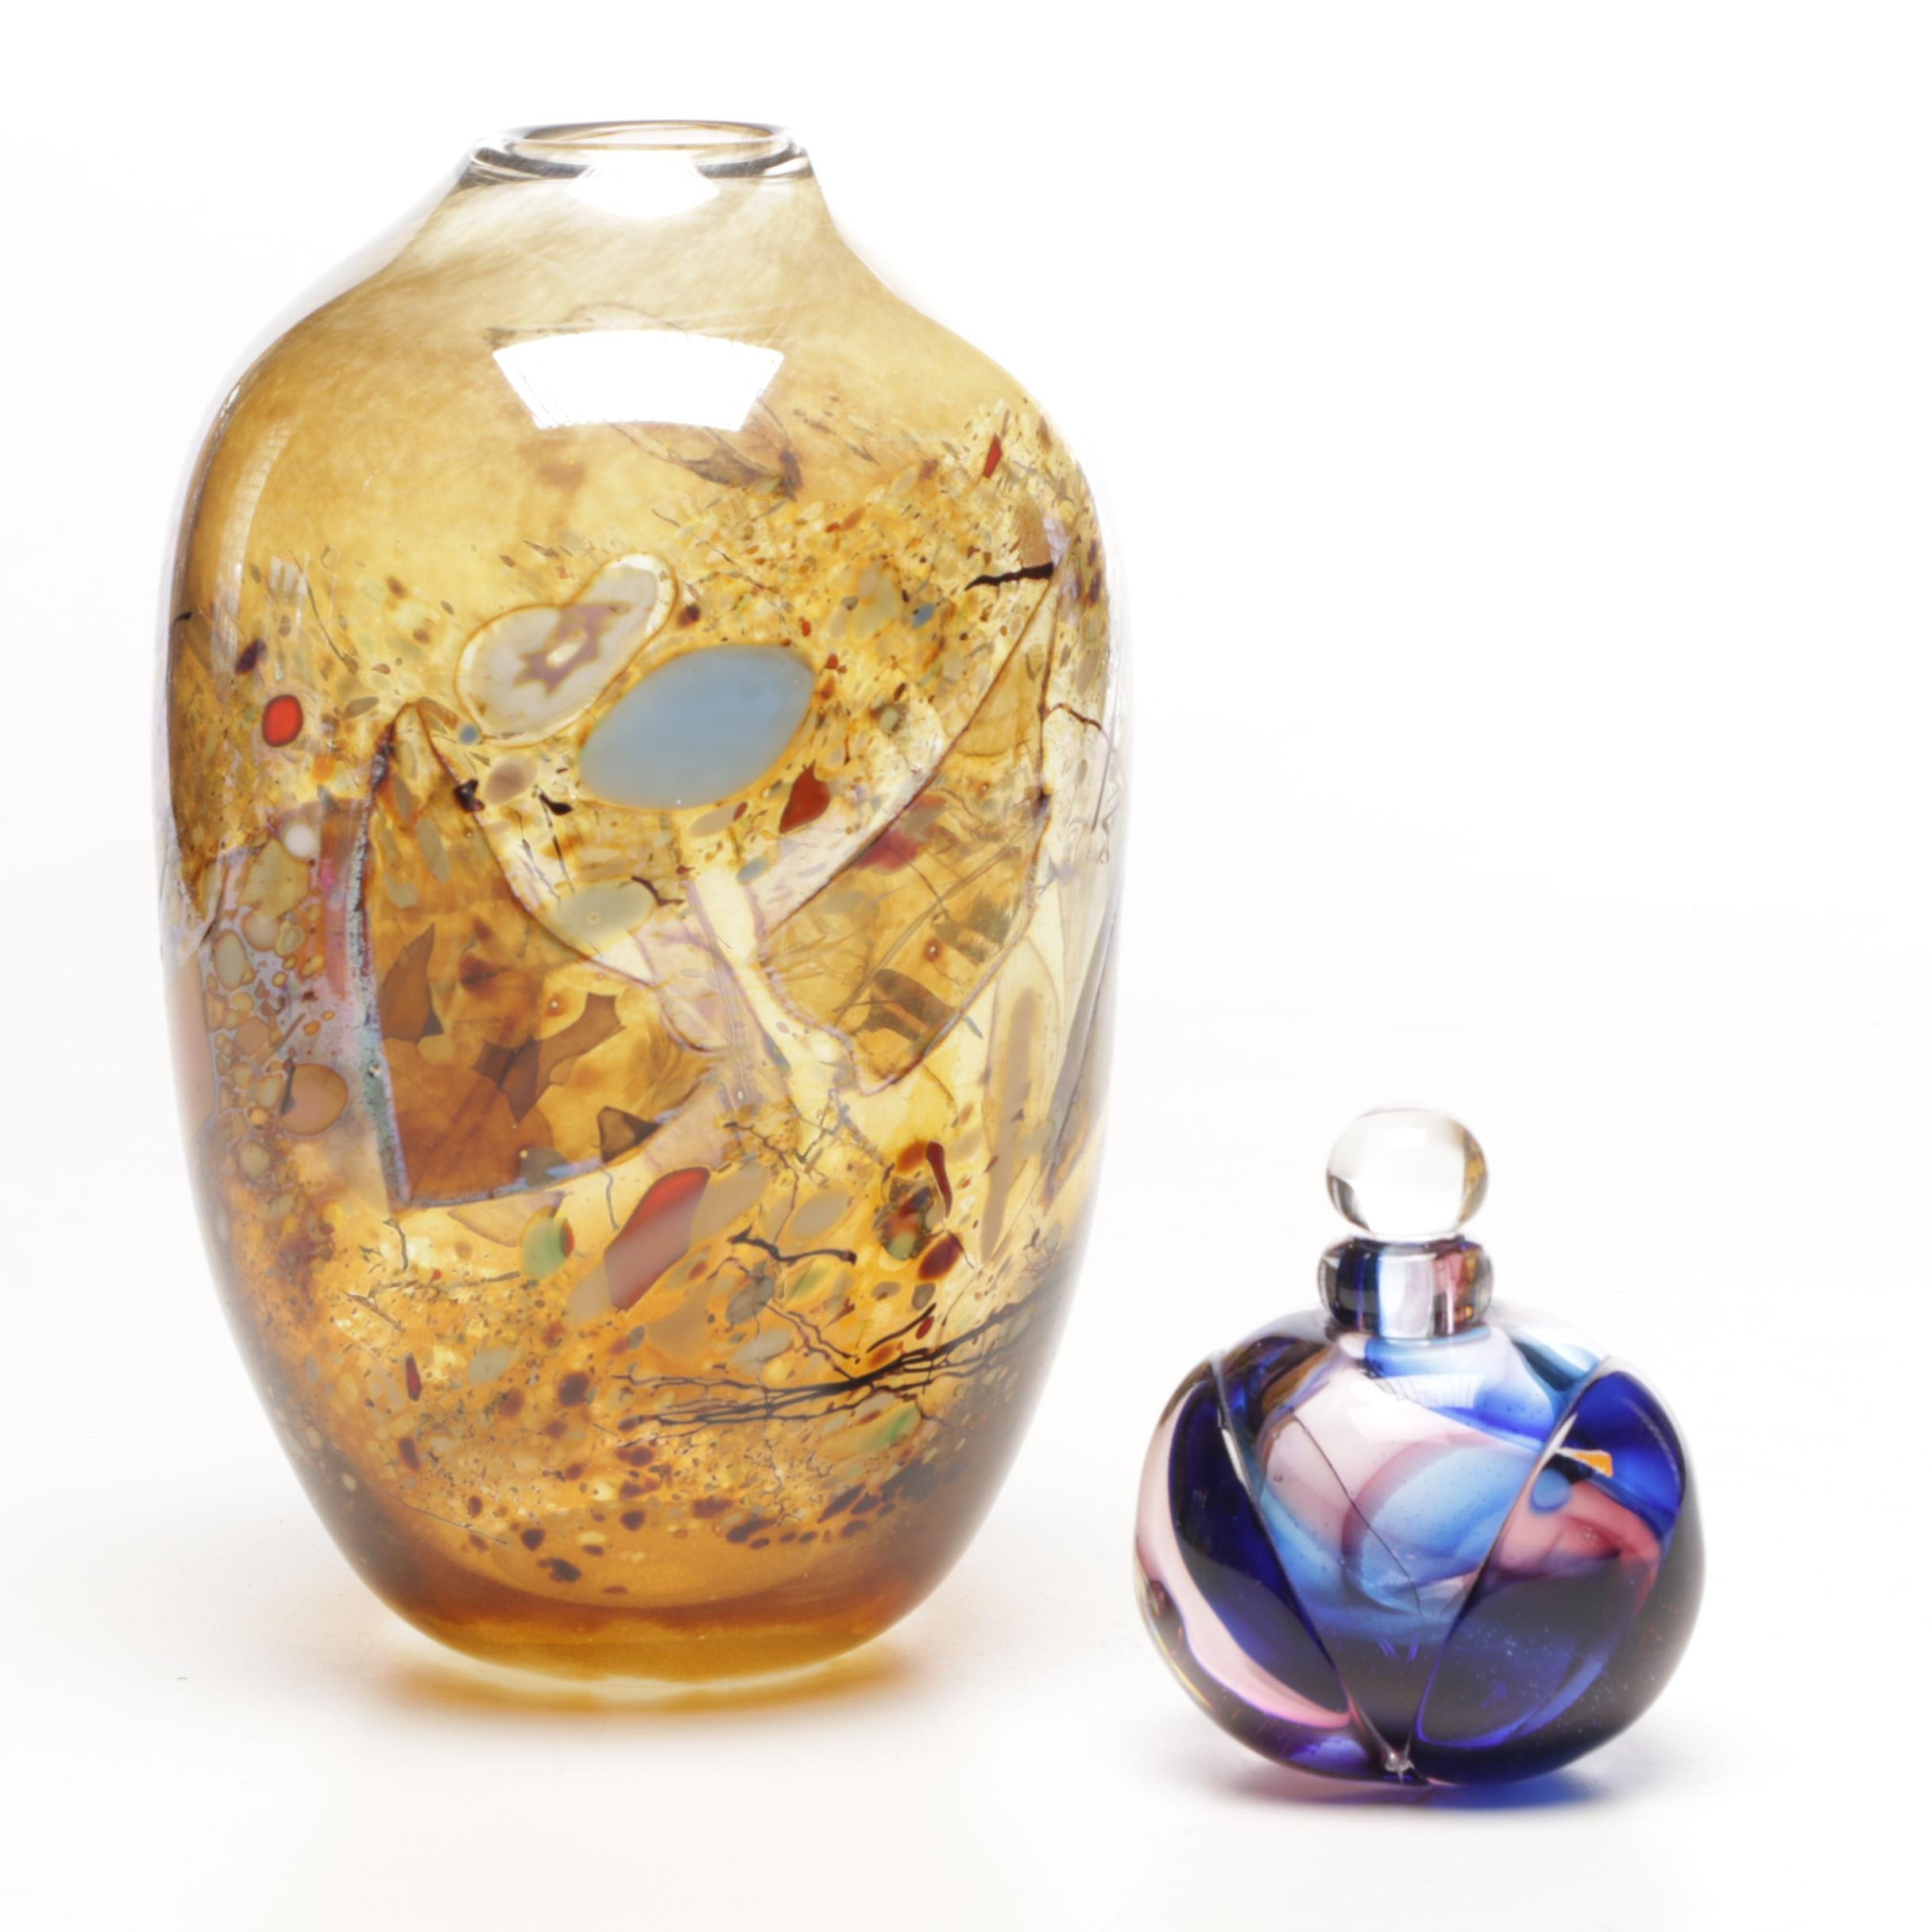 Signed Christopher Belleau Art Glass Vase and Carmen Ray Coyle Perfume Bottle